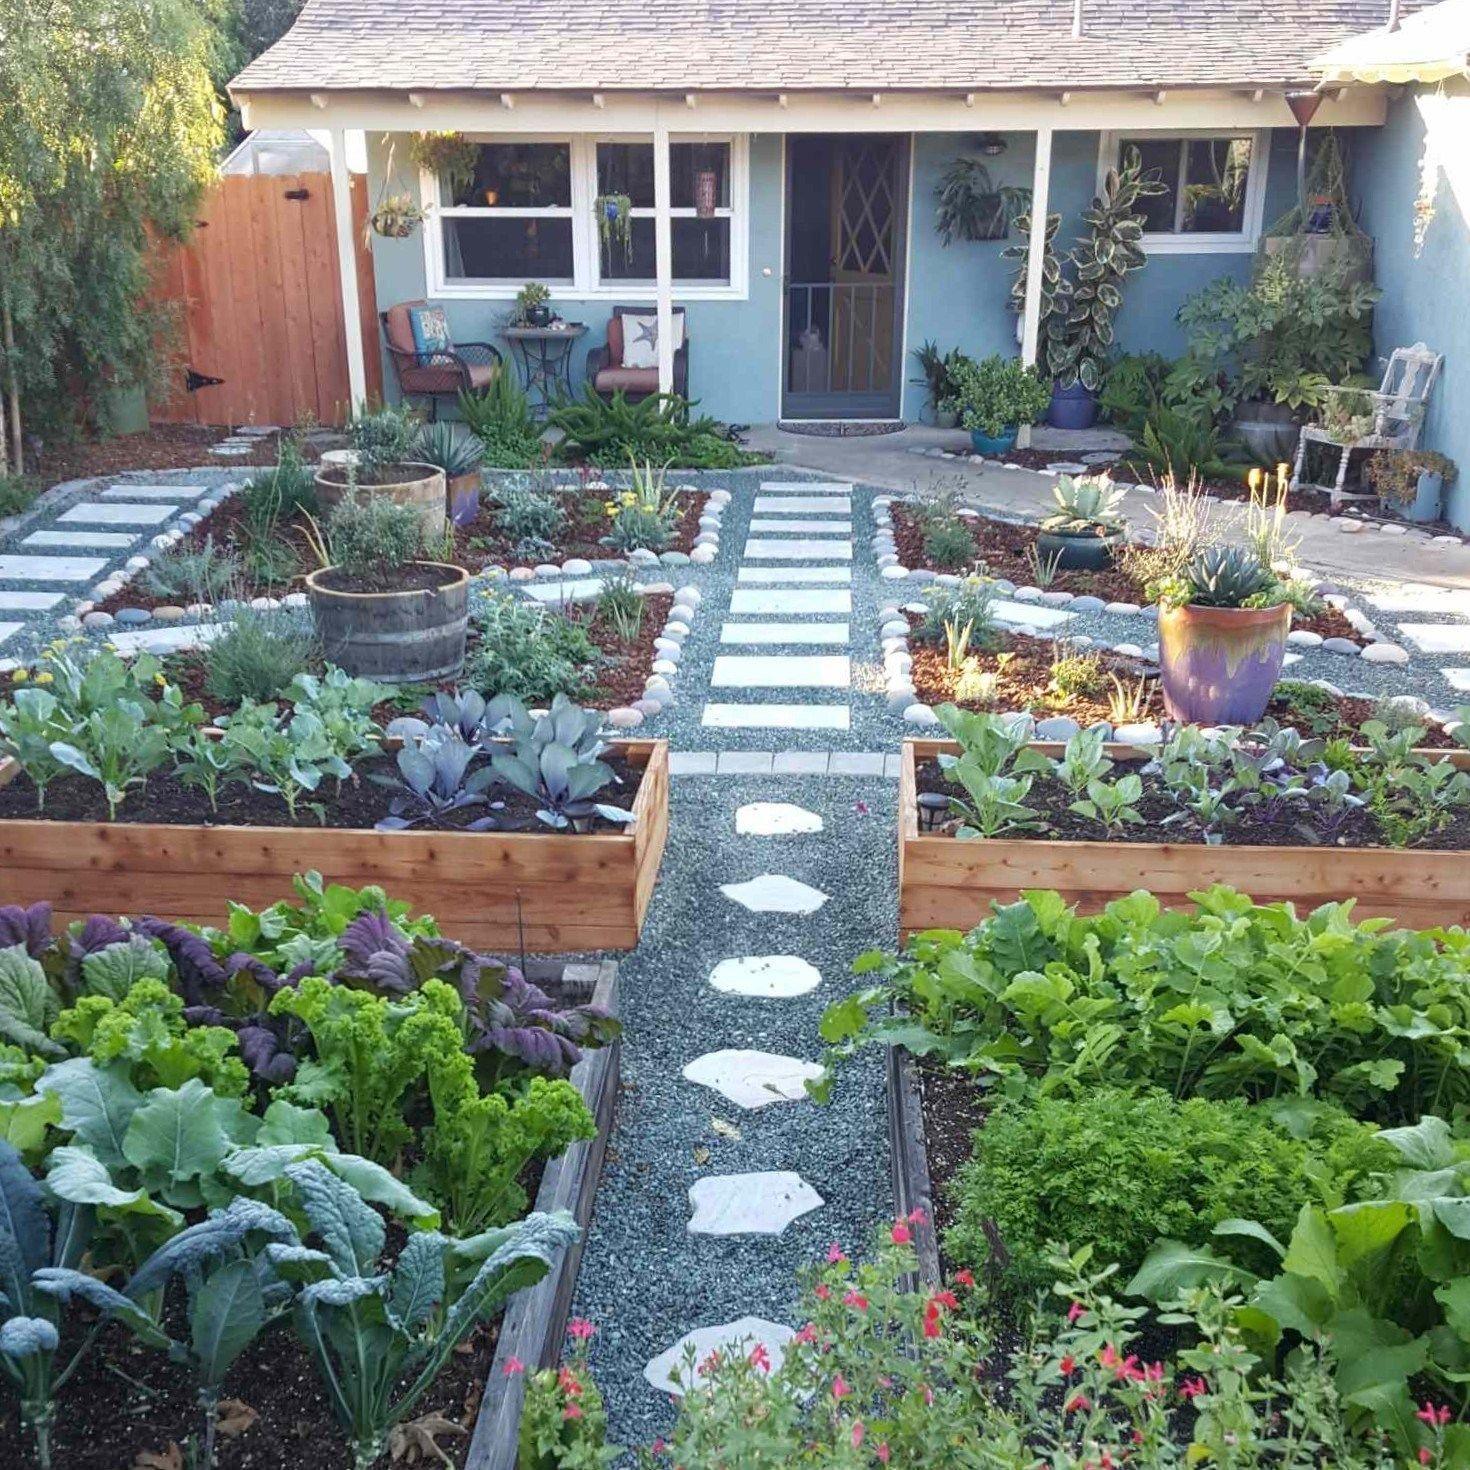 How To Start A Garden: 101 ~ Homestead and Chill#chill #garden #homestead #start